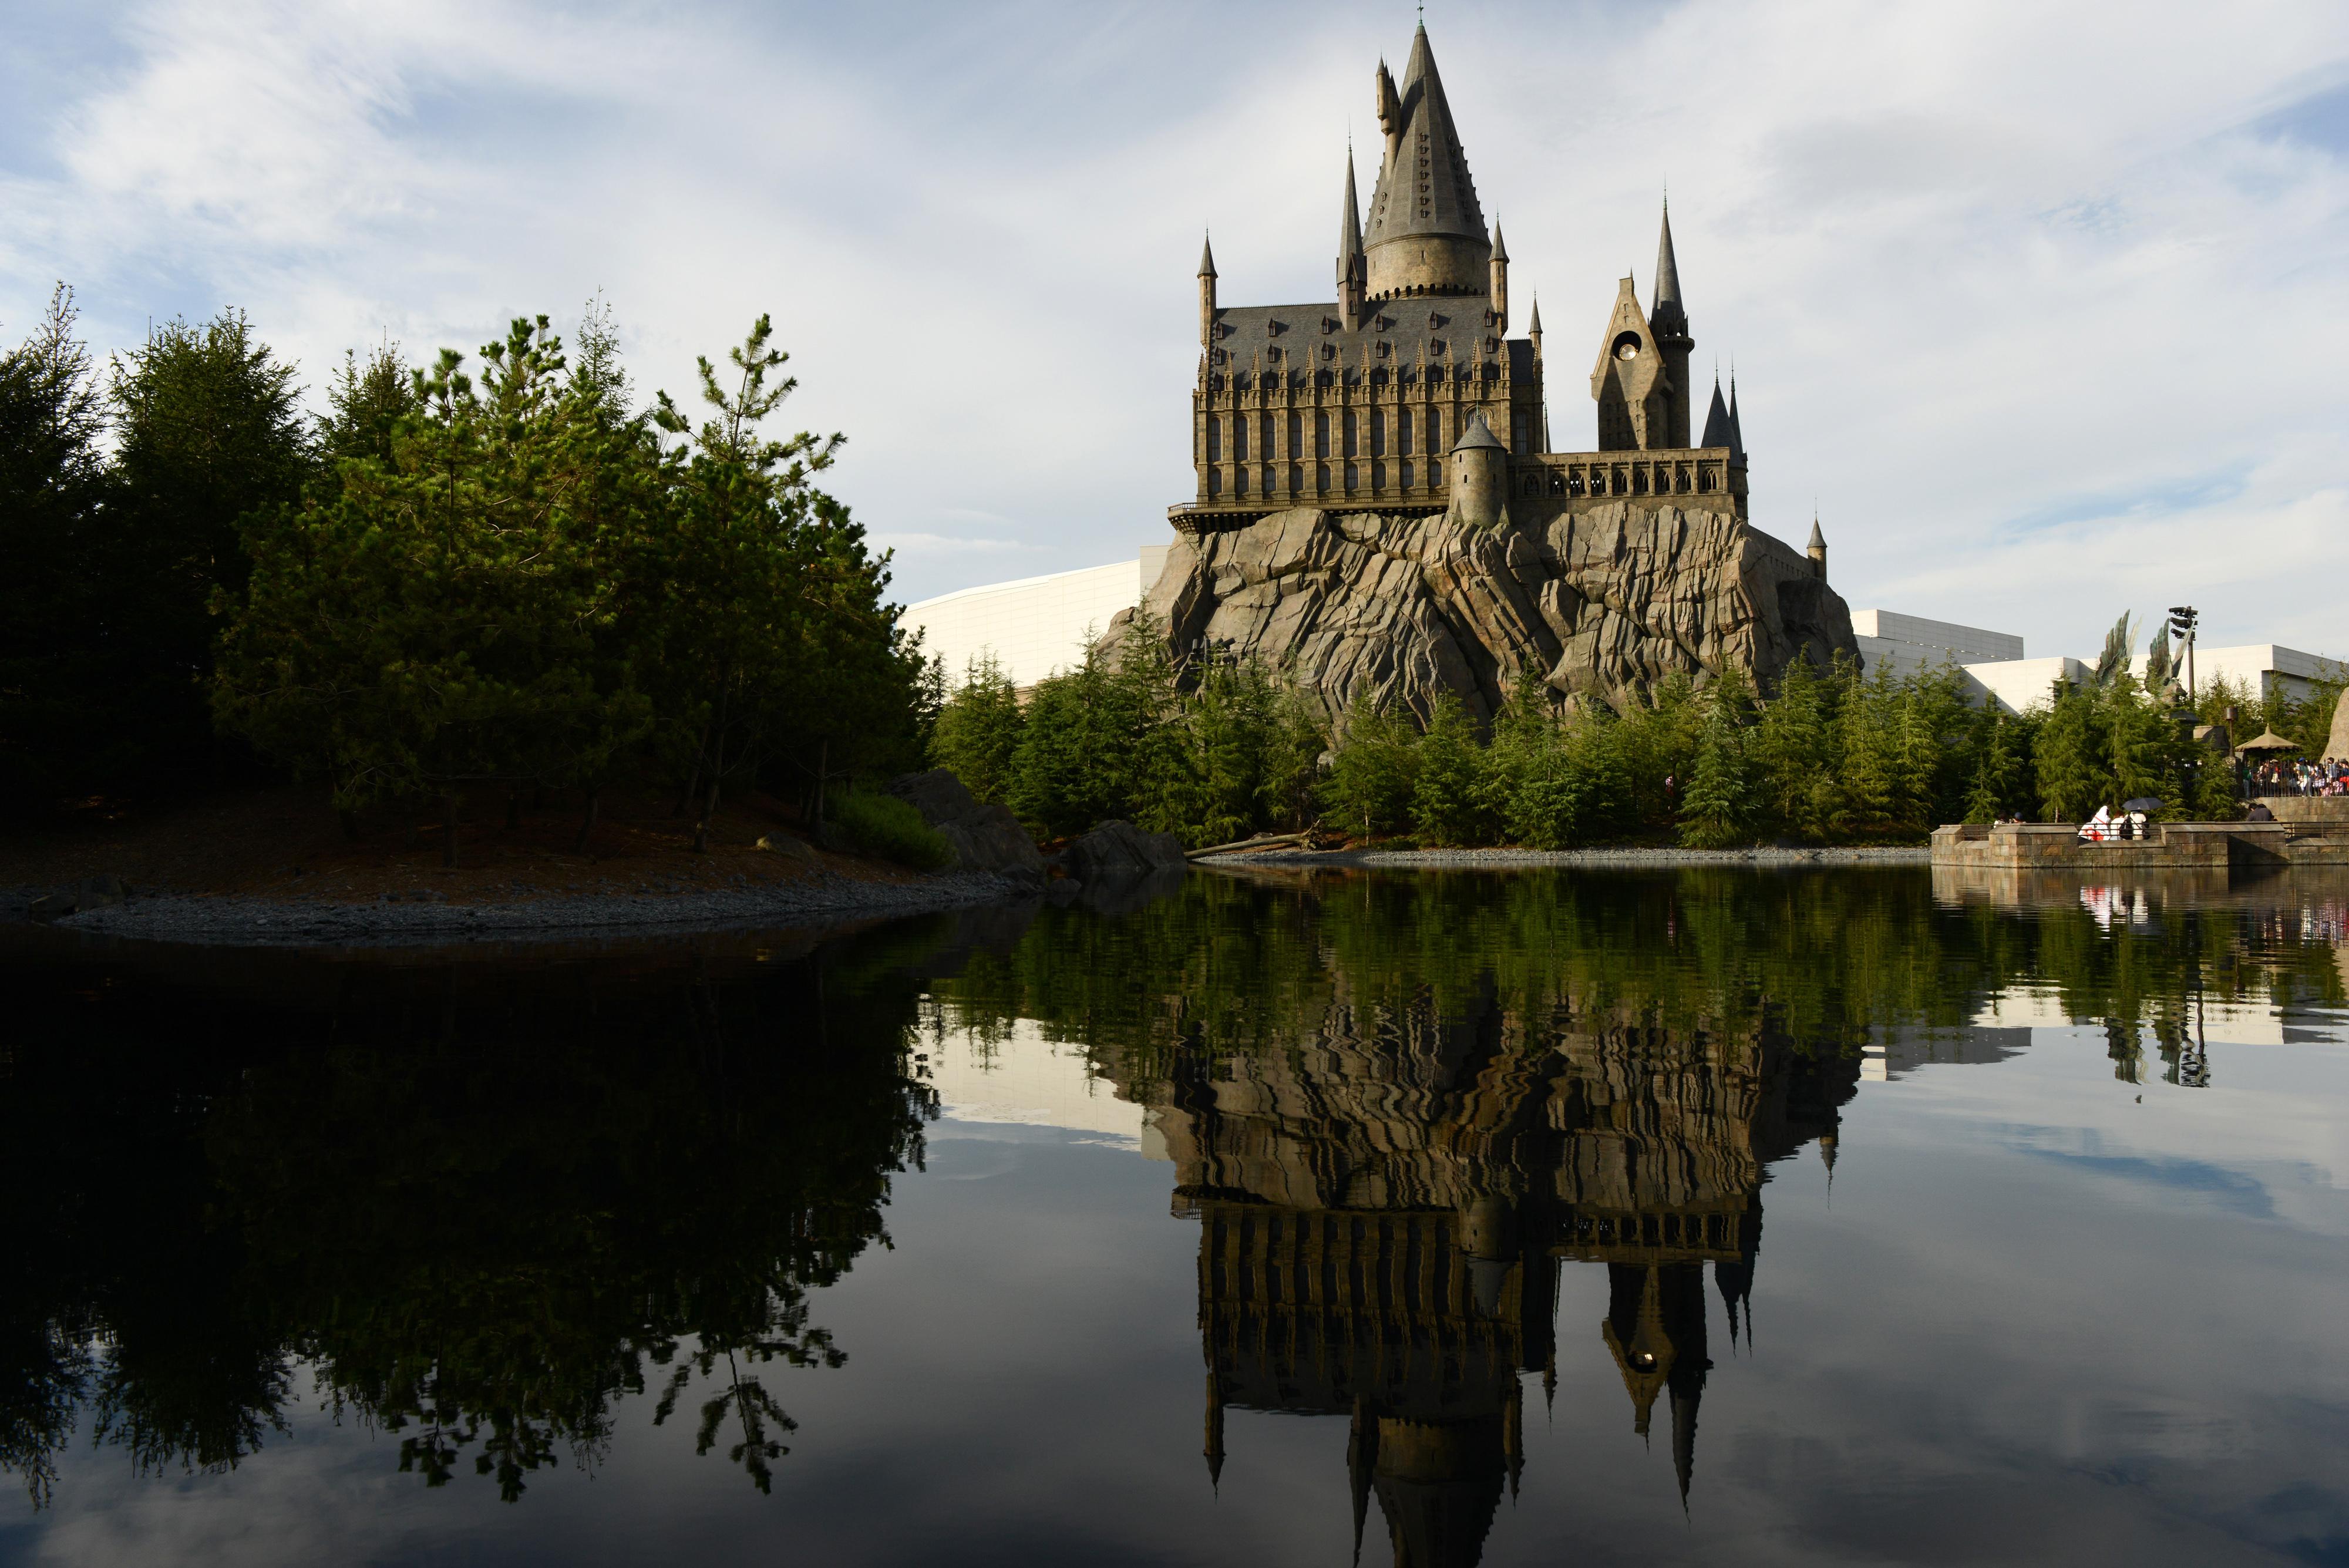 The Wizarding World of Harry Potter themed, Universal Studios Japan, Osaka, Japan